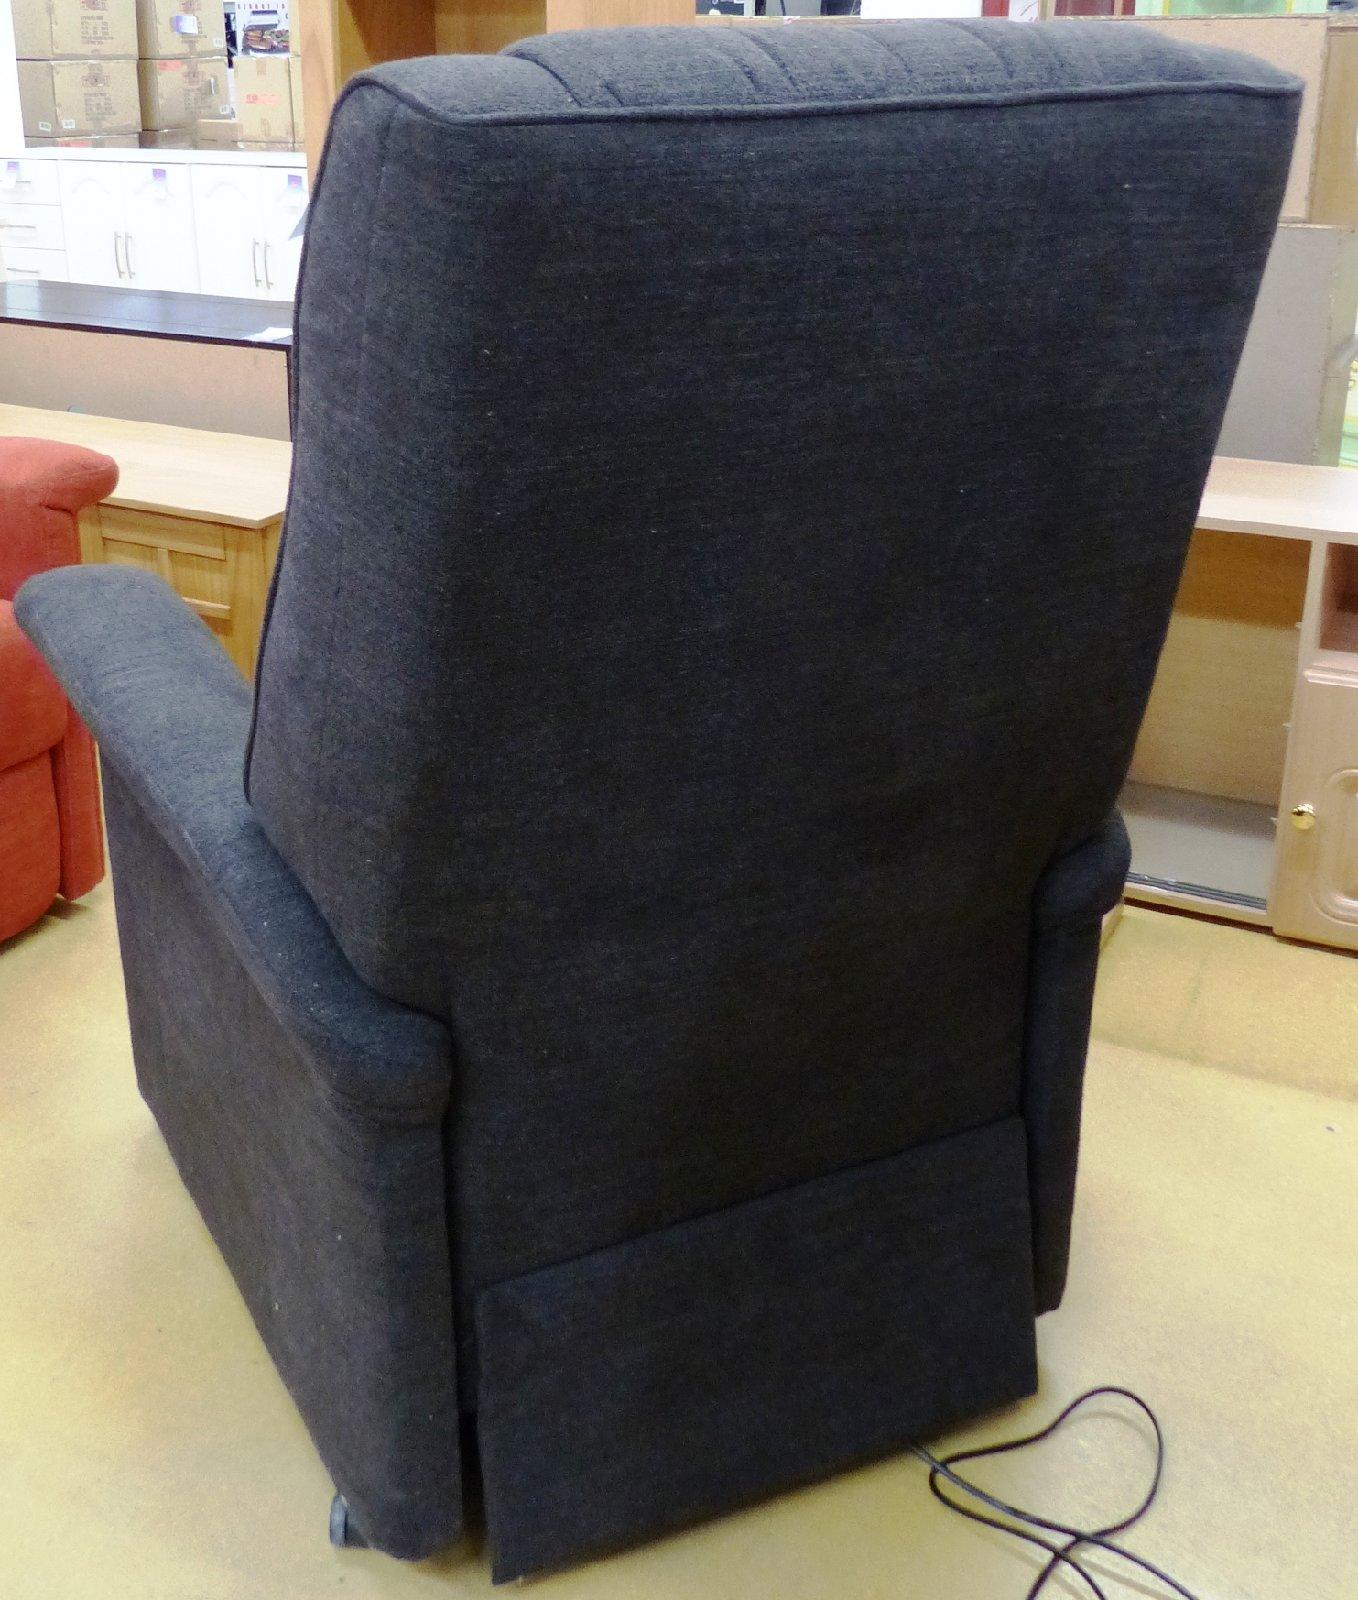 relaxsessel mit aufstehhilfe dunkelbraun tv sessel. Black Bedroom Furniture Sets. Home Design Ideas